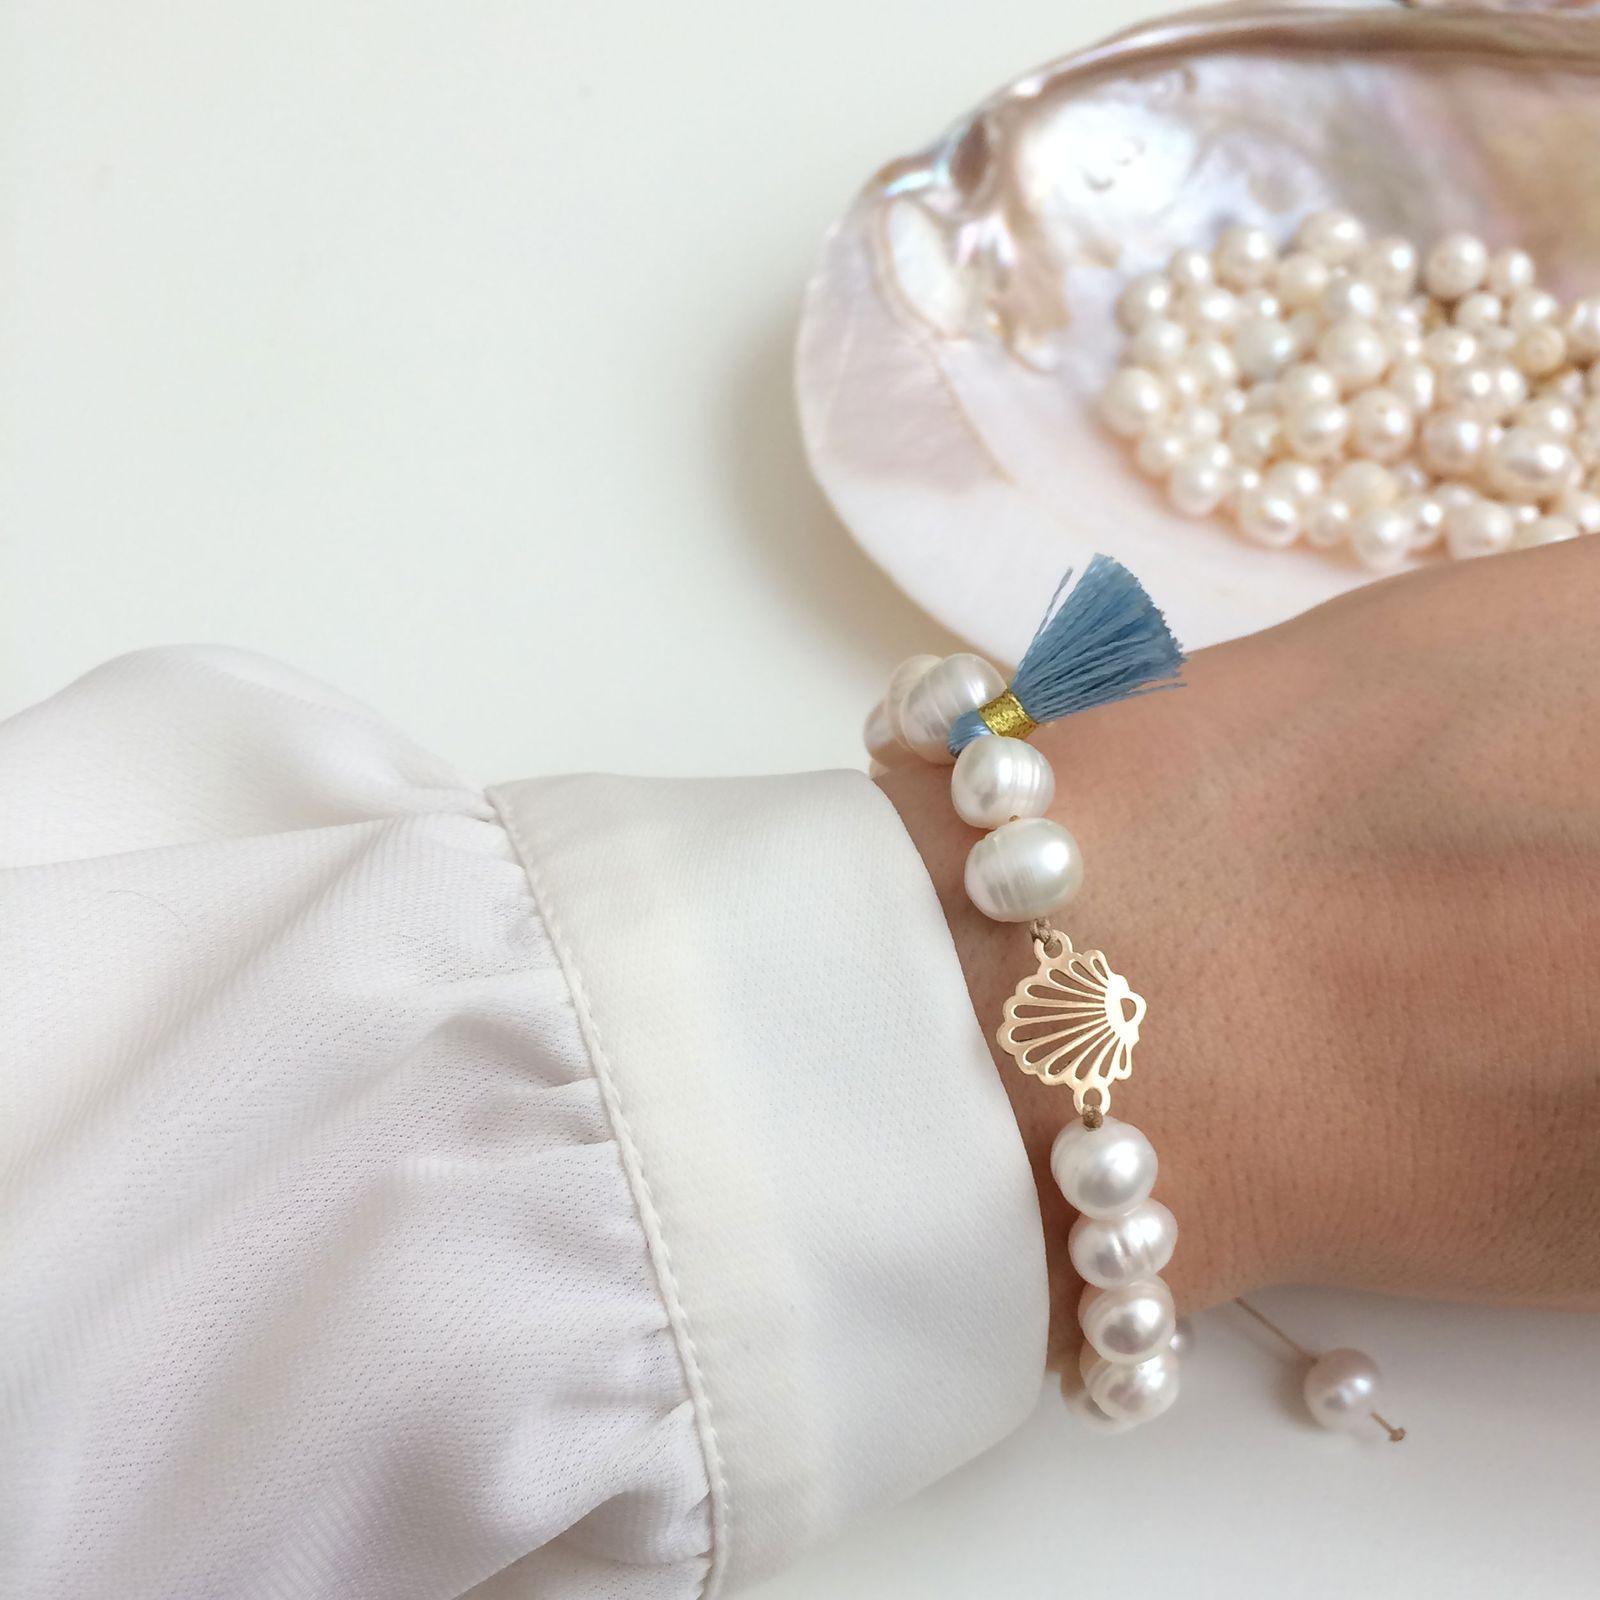 دستبند طلا 18 عیار زنانه الماسین آذر کد SADAF03 -  - 3